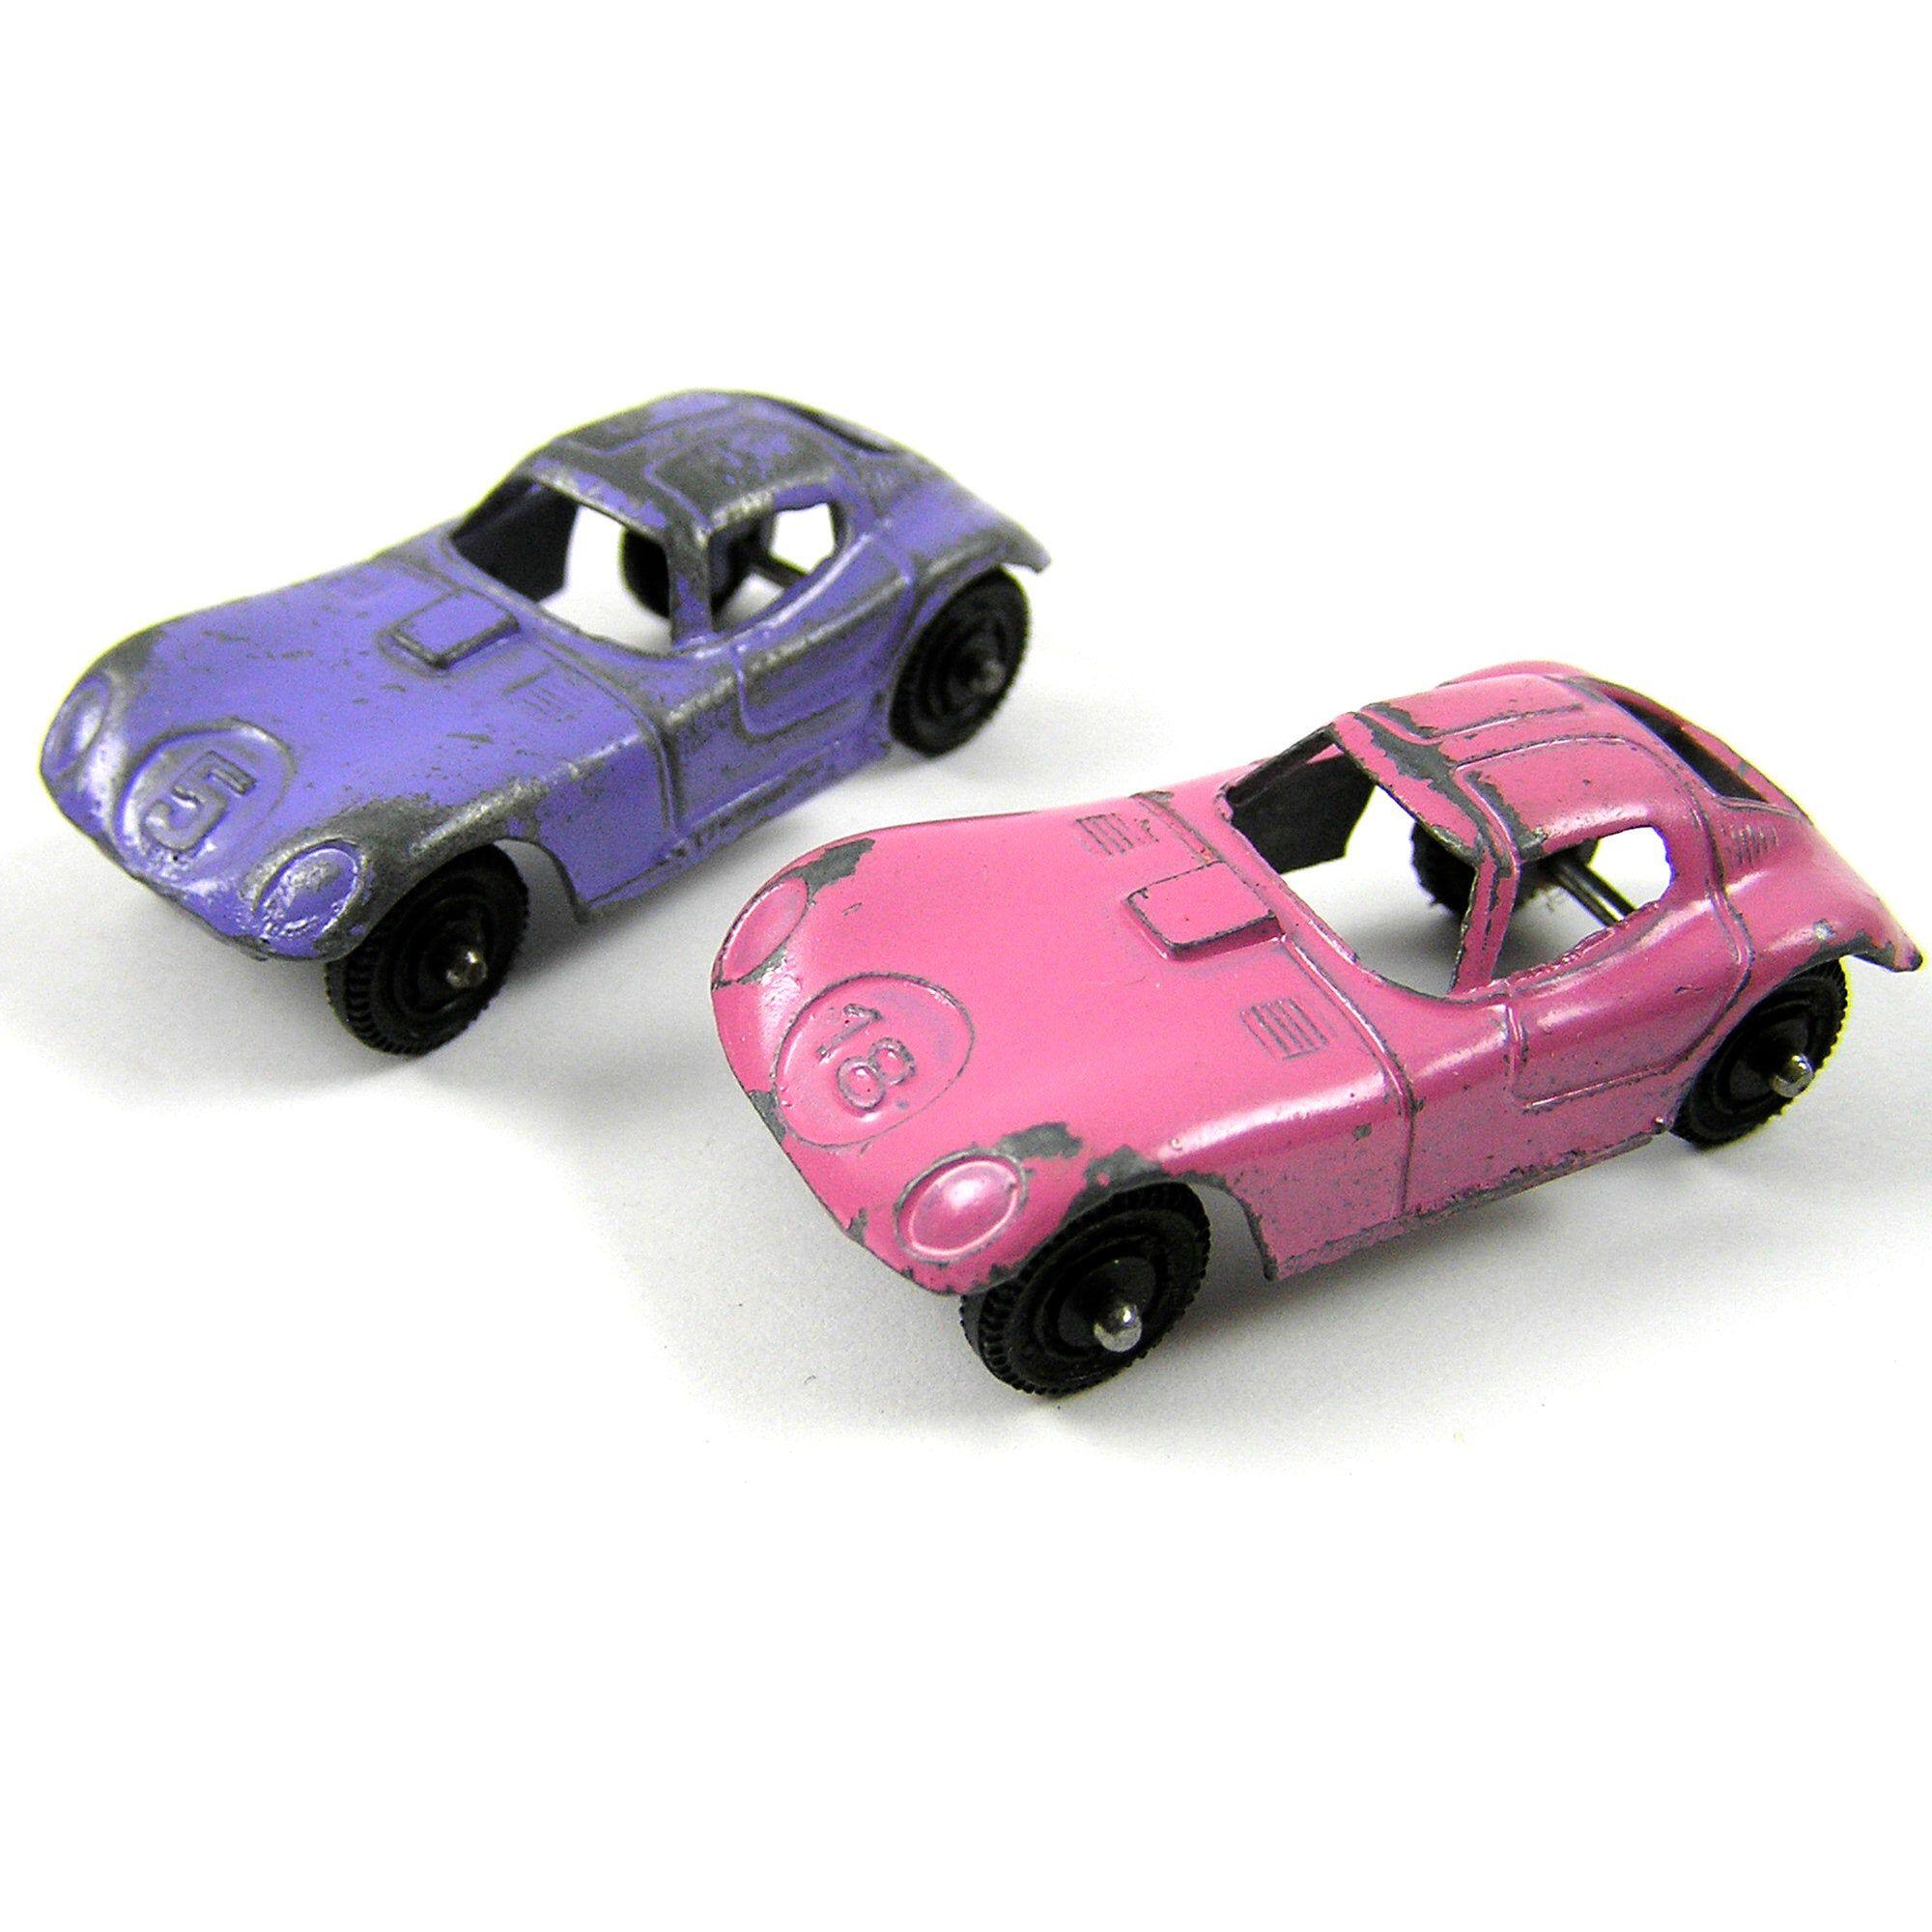 1960s Tootsietoy Indy Race Car 12 Tootsietoy Miniature Race Etsy Racing Race Cars Car